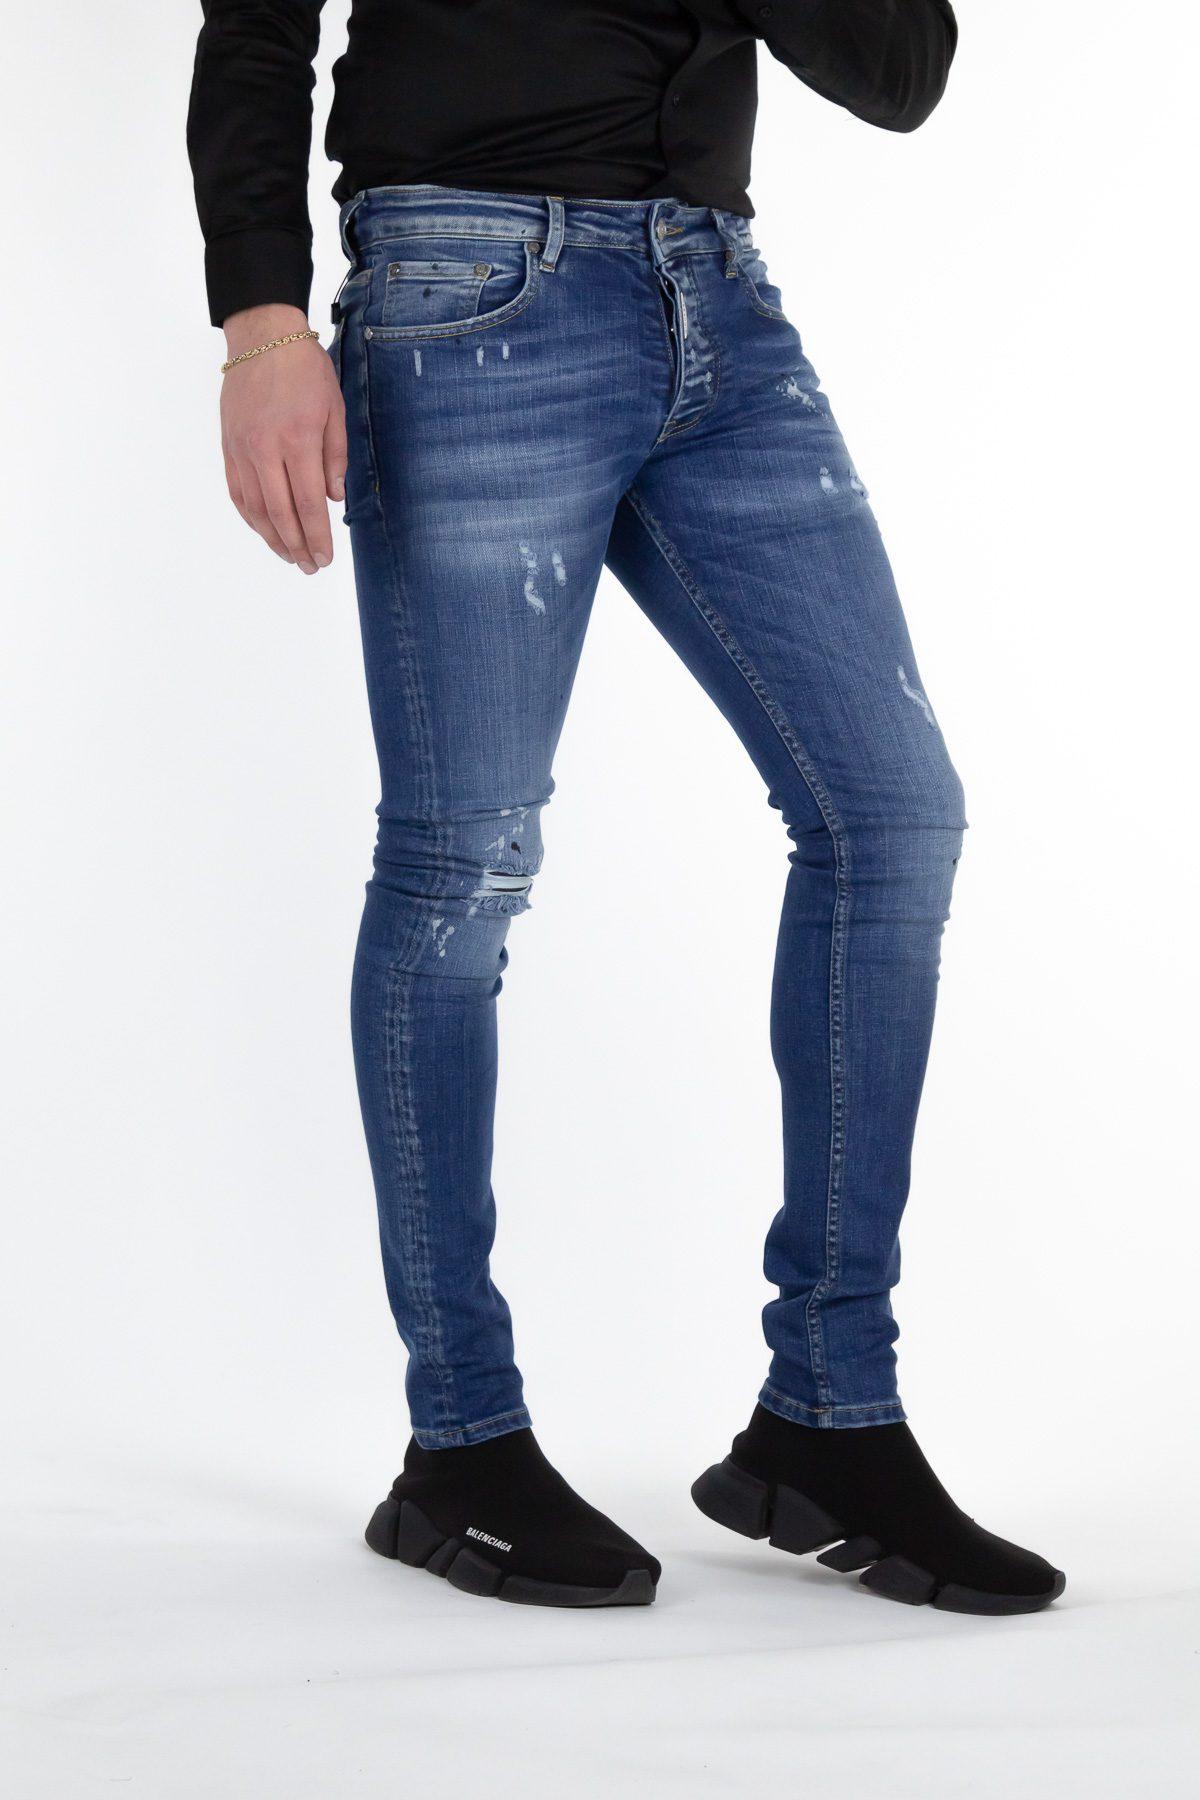 Richesse Milan Blue Jeans 2237-3